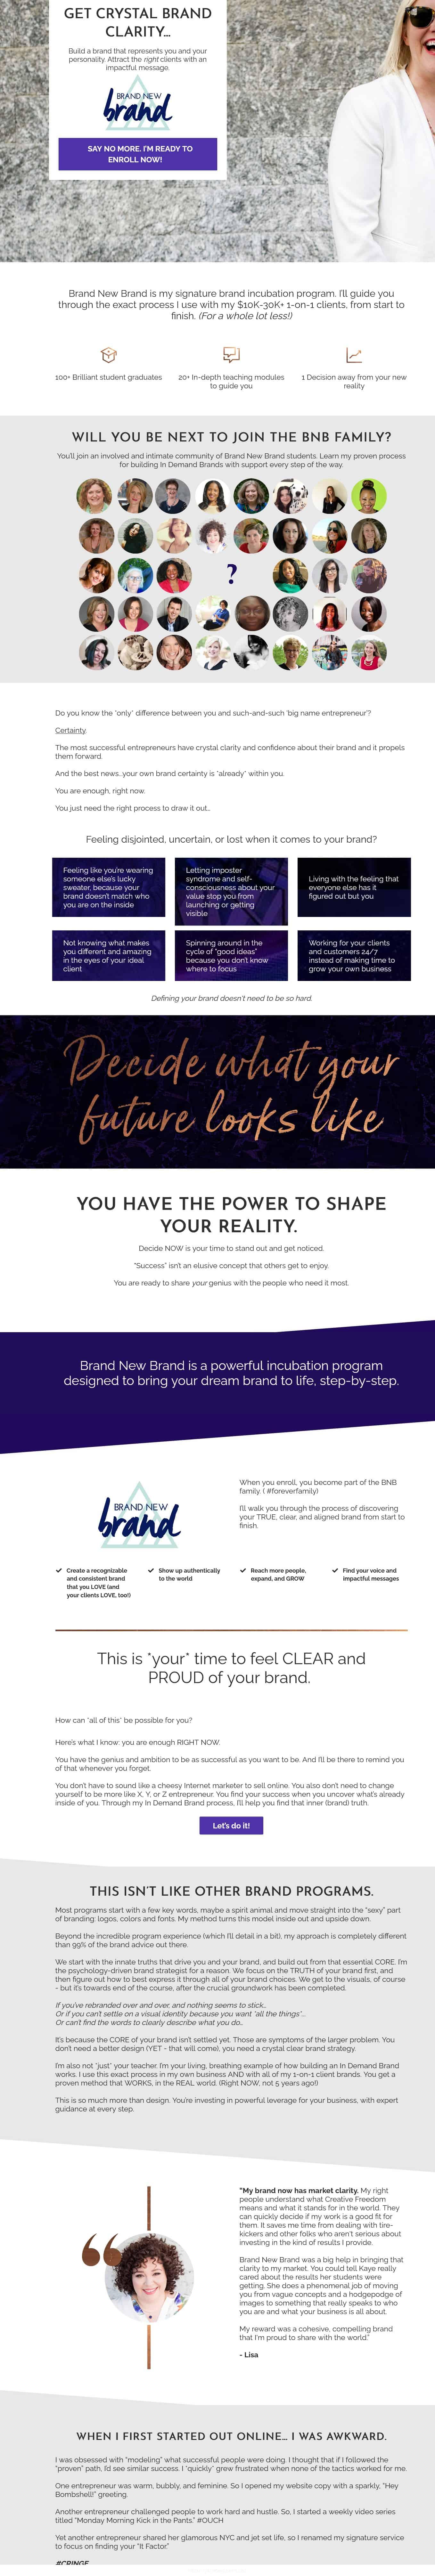 Brand New Brand by Kaye Putnam Sales Page